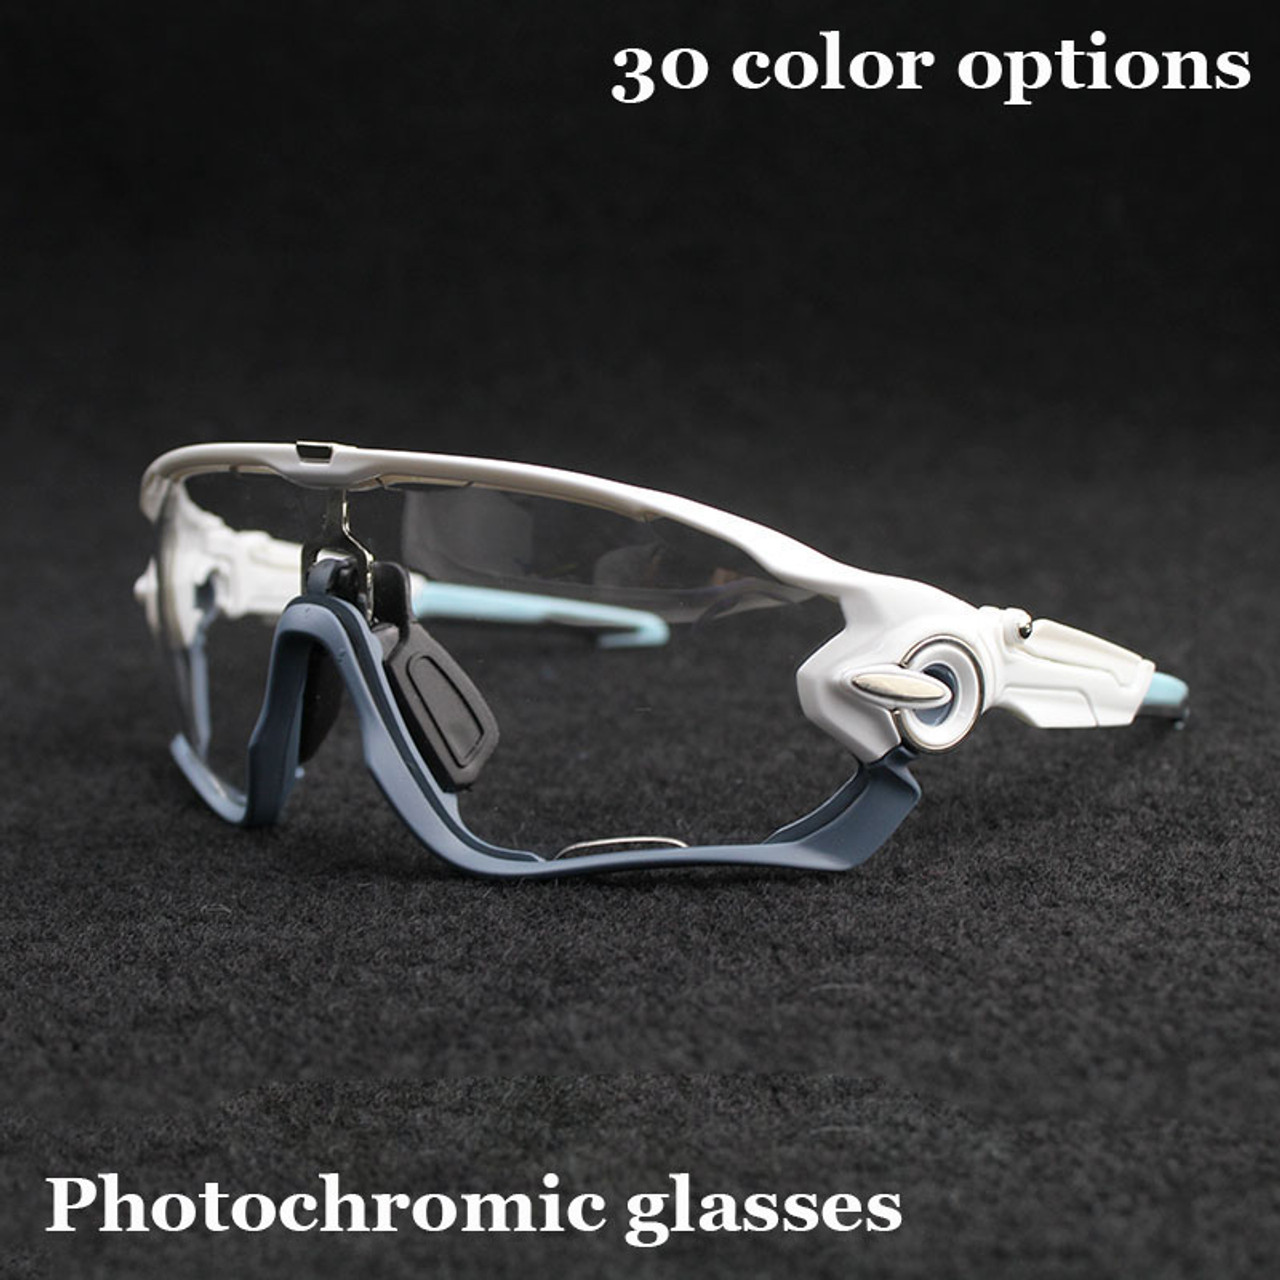 999380a87 ... JBR Photochromic Cycling Glasses Men Women Sports MTB Mountain Road Bike  Bicycle Cycling Sunglasses Eyewear UV400 ...